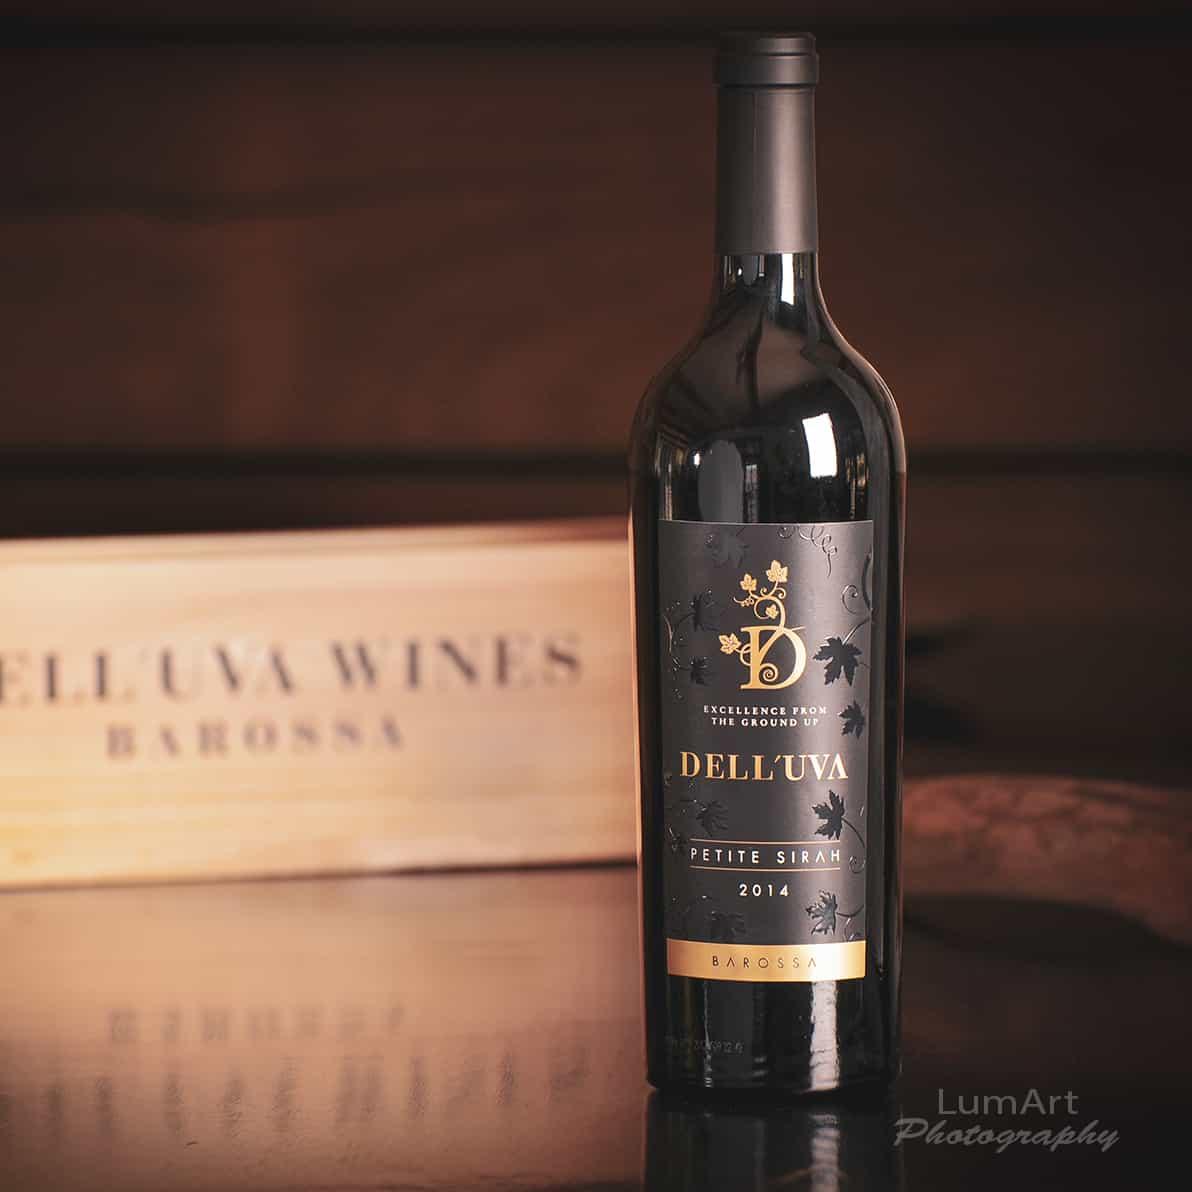 LumArt_Food and Wine_17_Delluva_Petite Shiraz Lifestyle